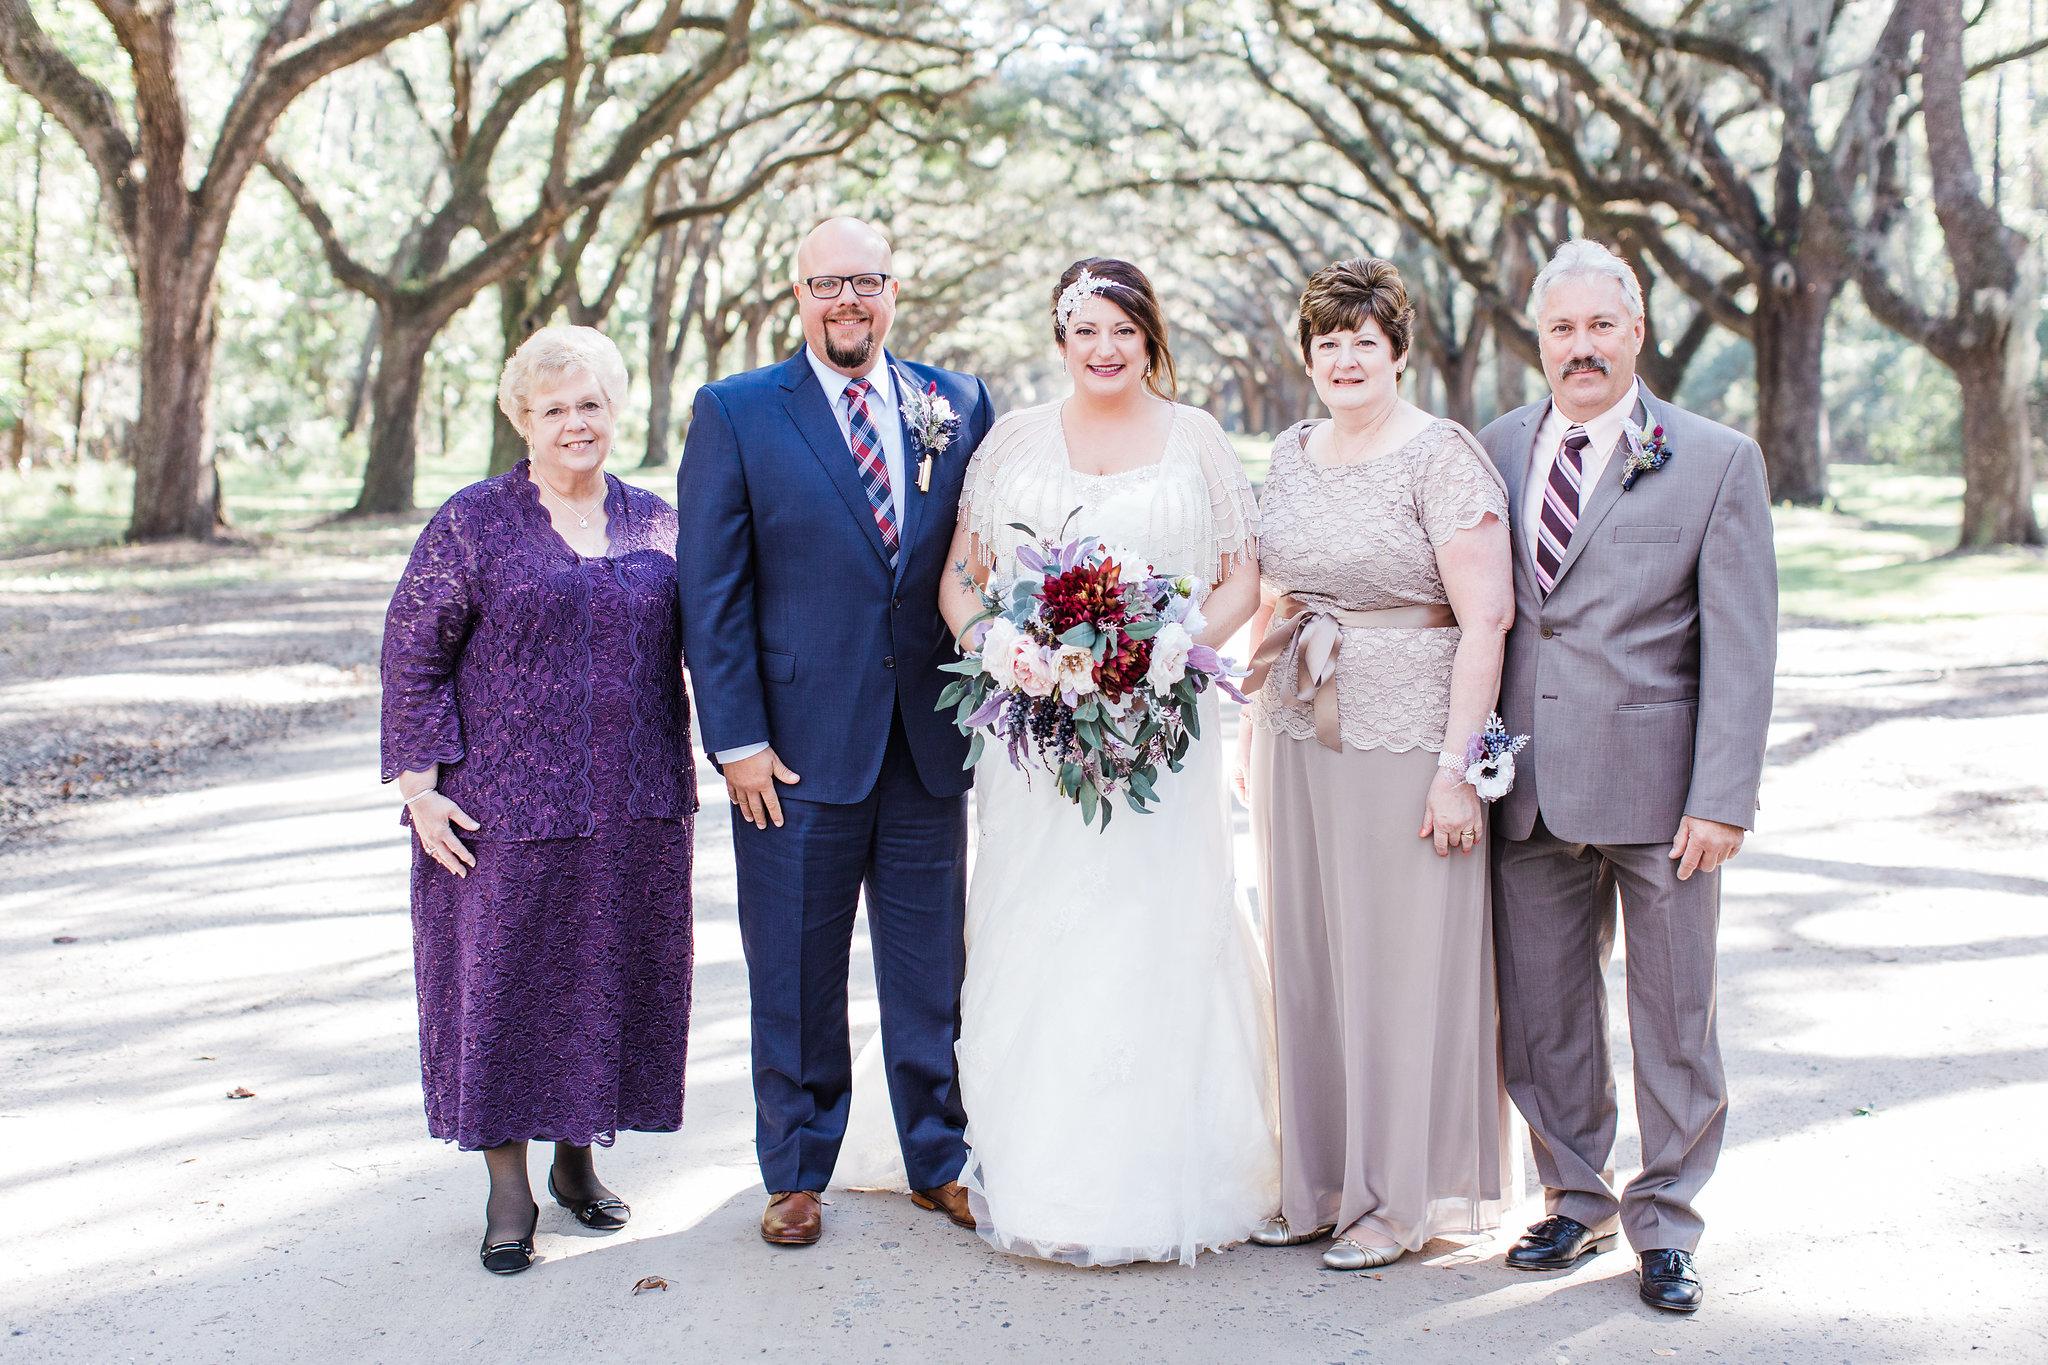 apt-b-photography-kristy-rob-wormsloe-elopment-savannah-wedding-photographer-savannah-elopement-wormsloe-wedding-historic-savannah-elopement-photographer-21.jpg